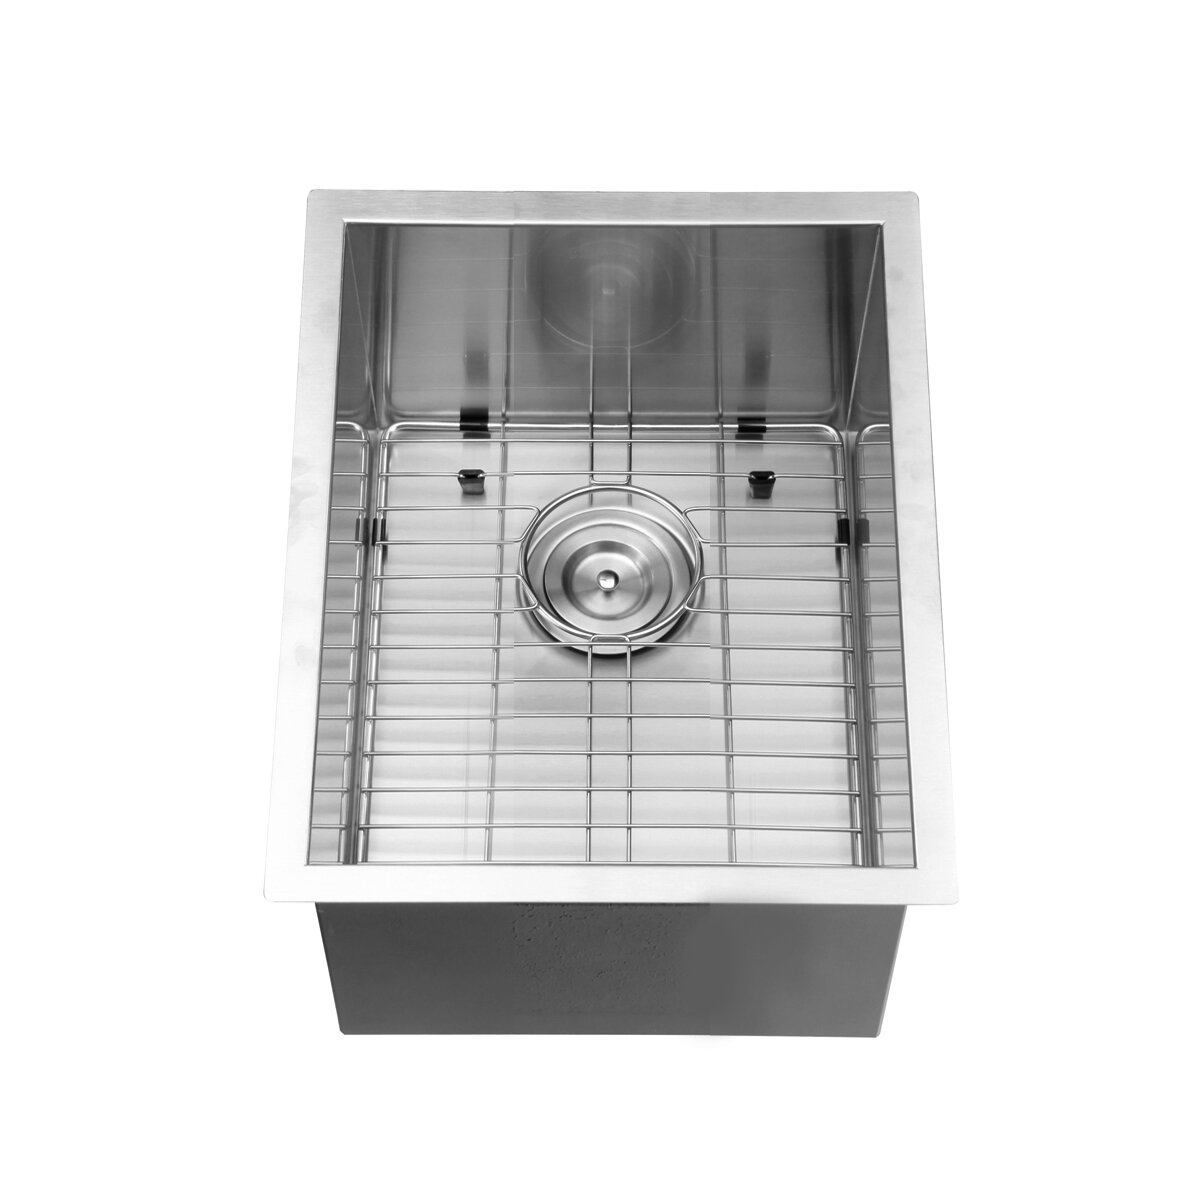 Queen Bedroom Sets Under 1000 Ruvati Nesta 14 Quot Undermount Single Bowl Bar Sink Amp Reviews